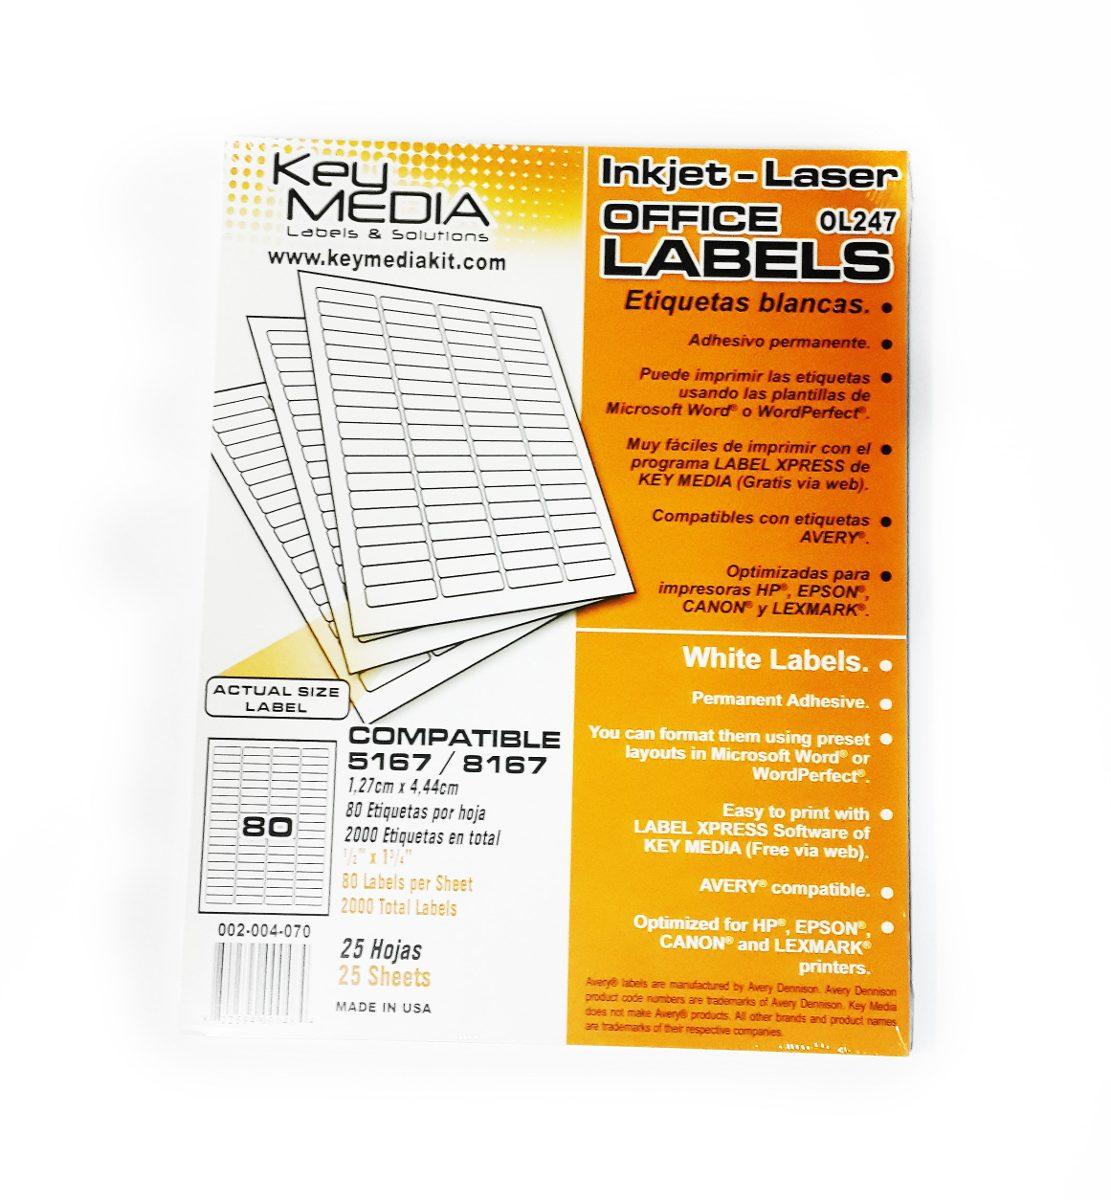 Etiquetas Autoadhesivas Marca Key Media Código Avery 8167 - Bs. 0,04 ...